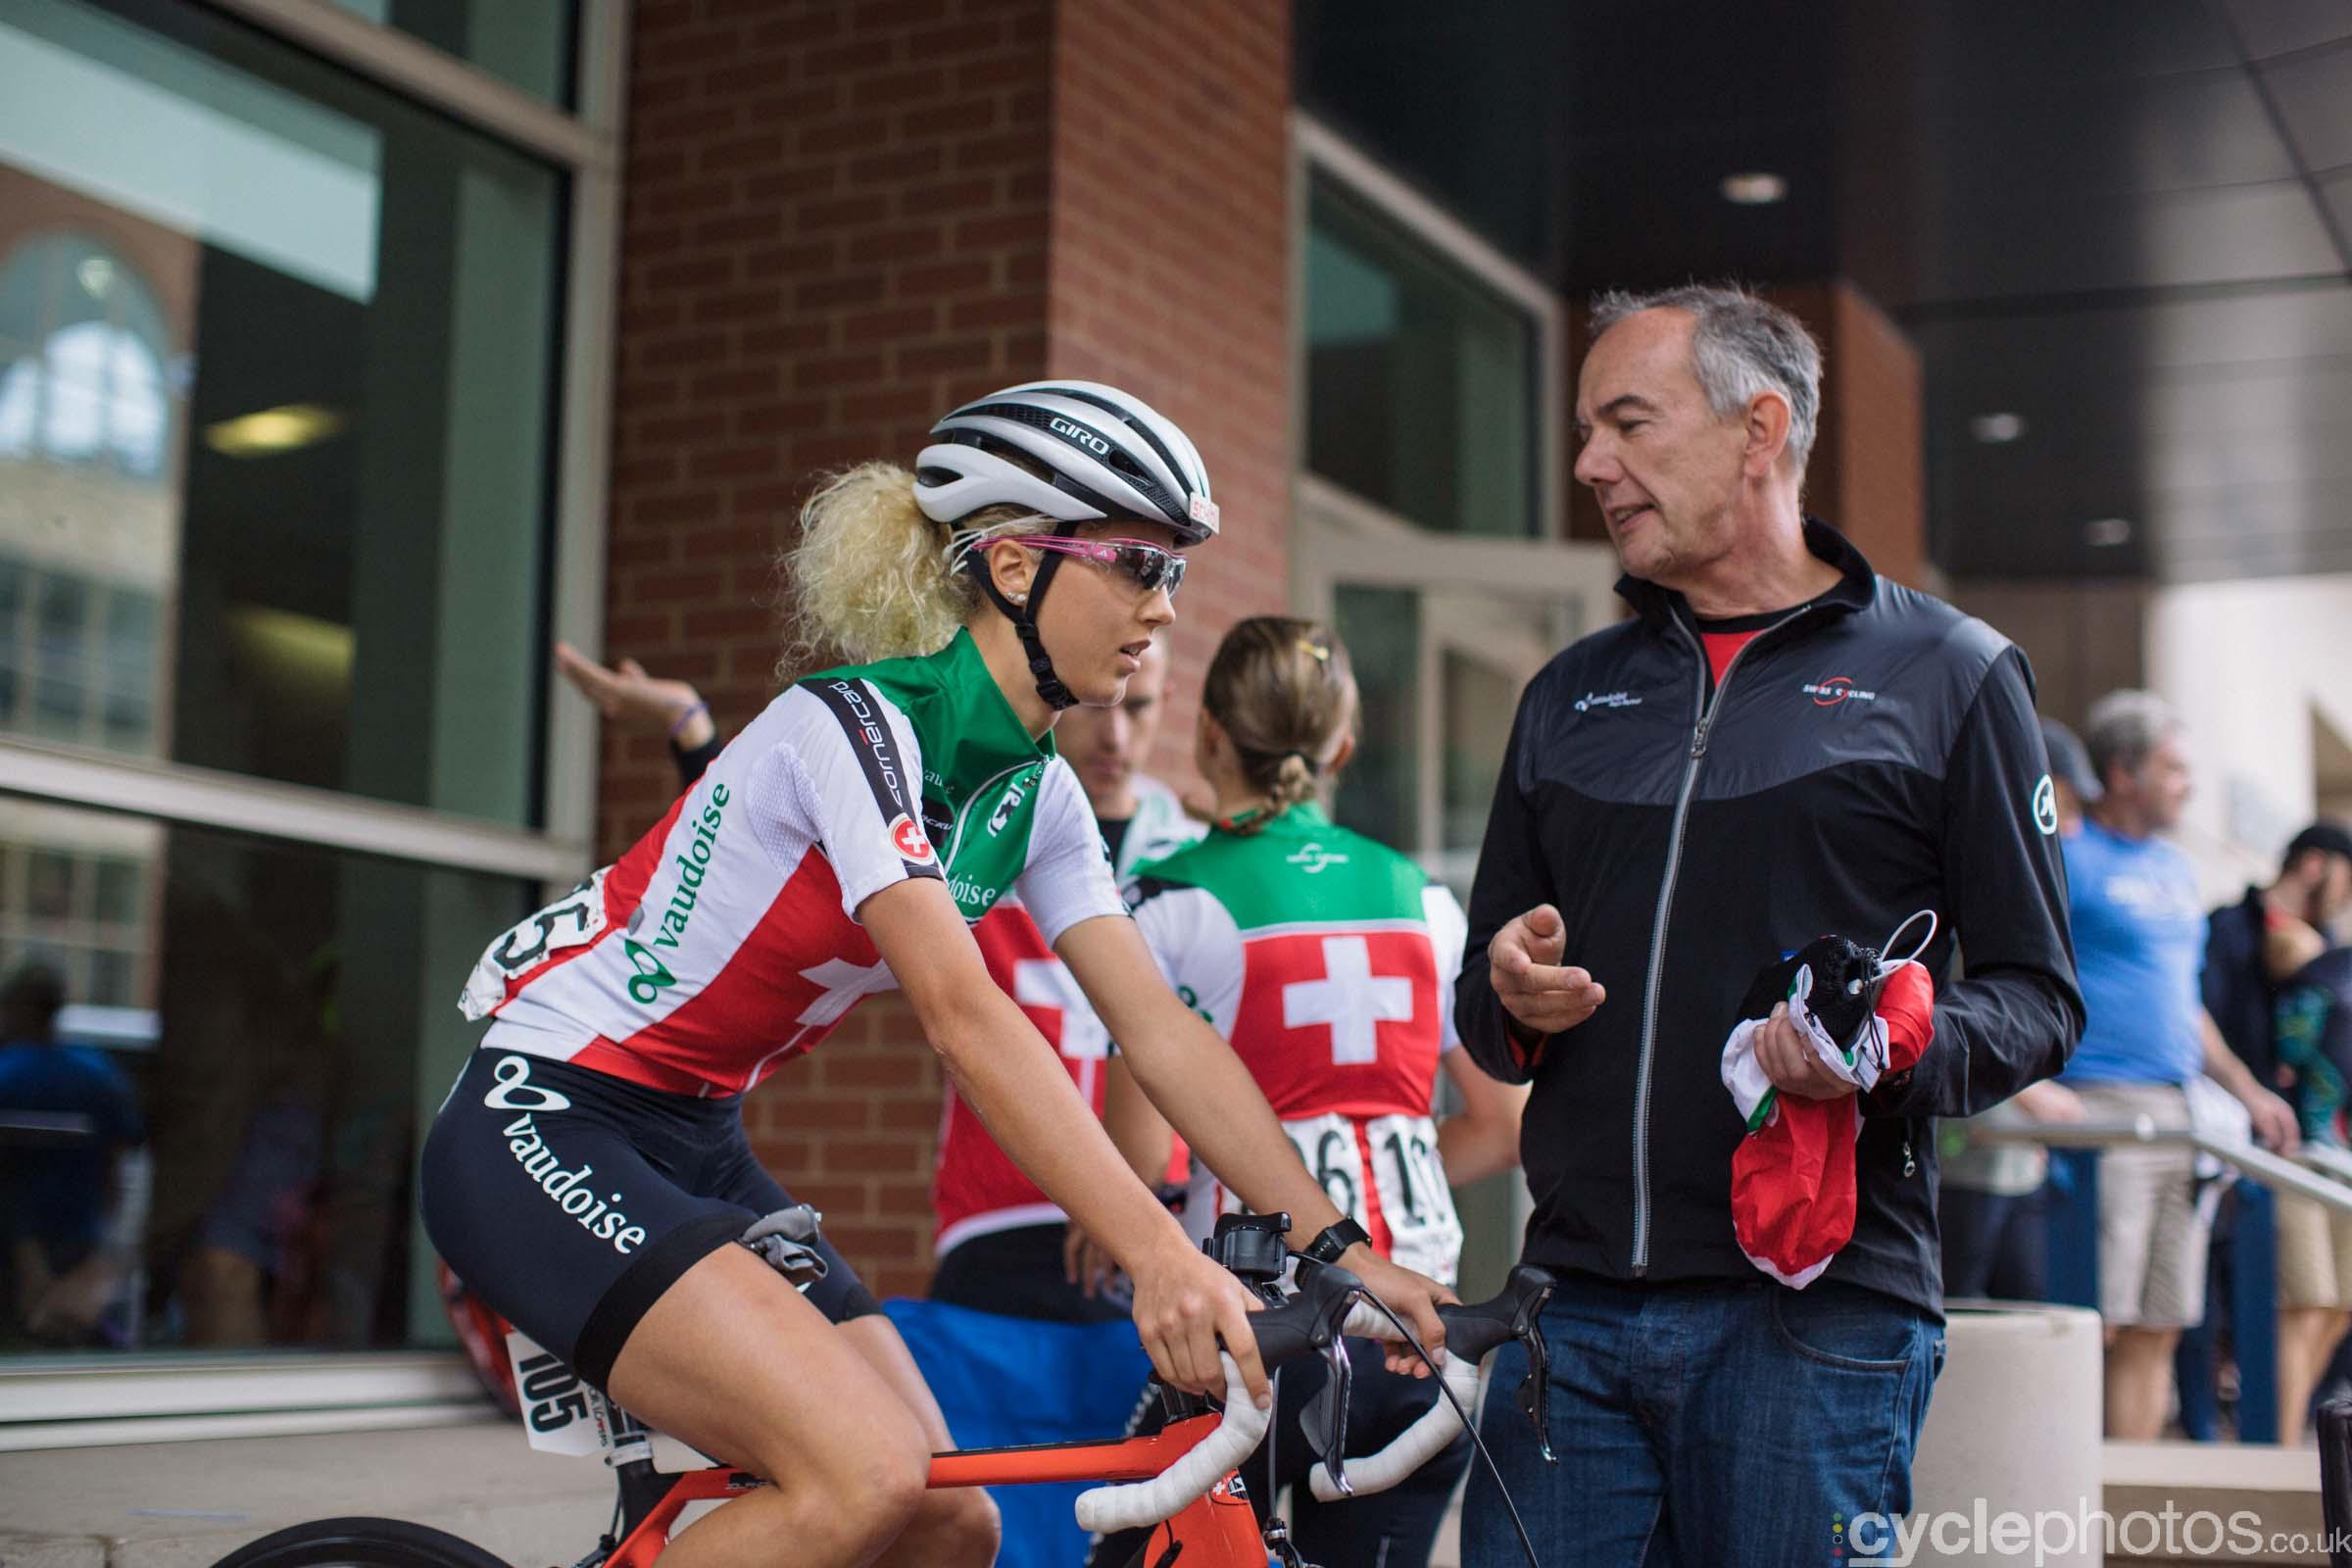 cyclephotos-world-champs-richmond-123818